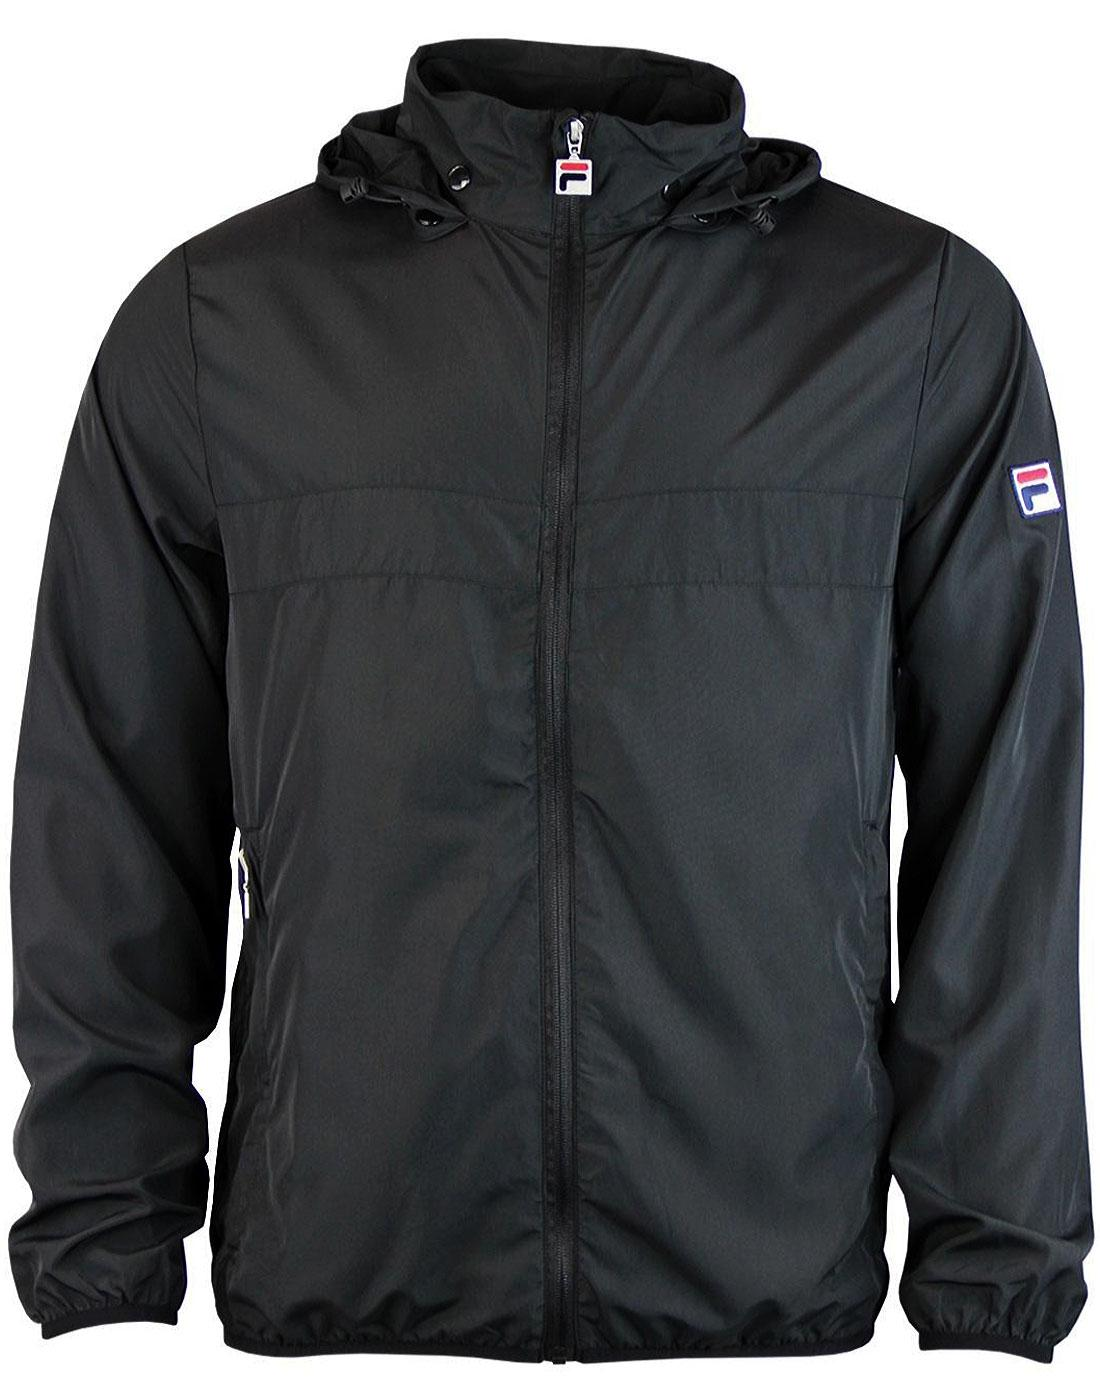 Cipolla 2 FILA VINTAGE Retro Pack Away Jacket (B)